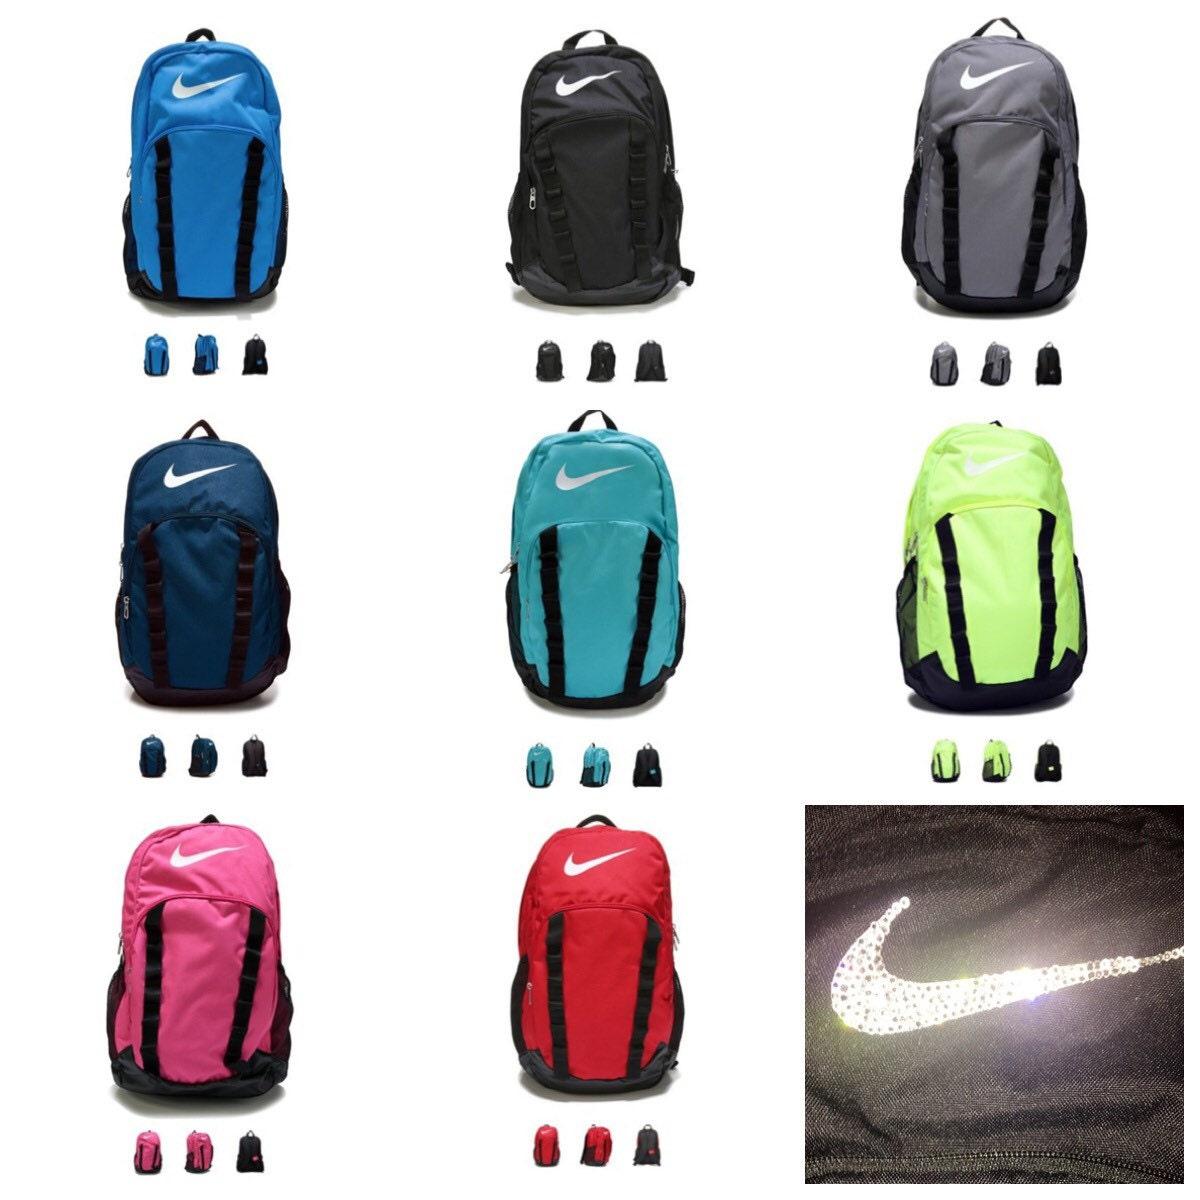 eca4578ef4 nike brasilia xl backpack cheap   OFF54% The Largest Catalog Discounts